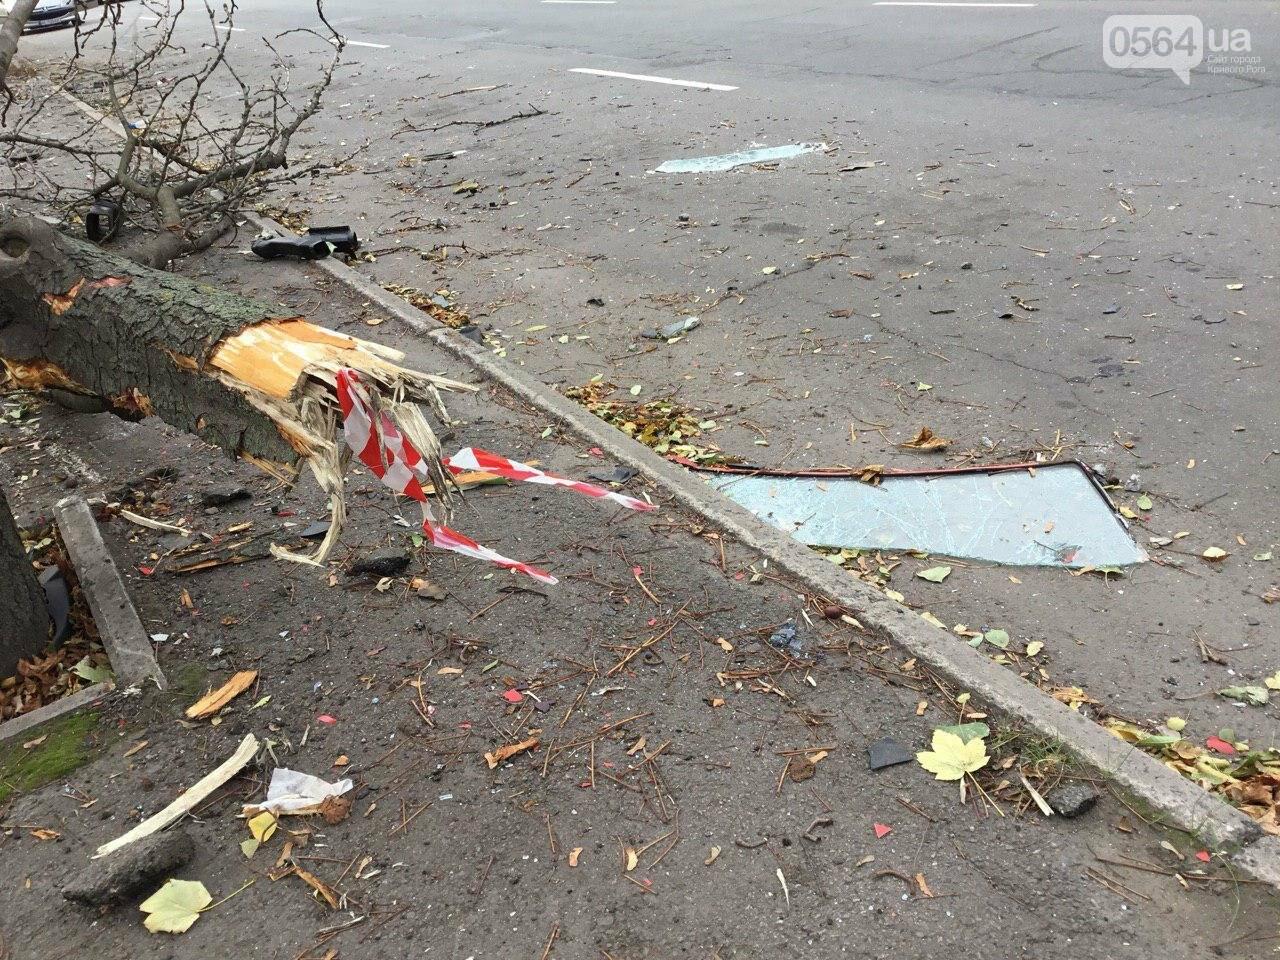 Куски стекла и обшивки разбившейся в Кривом Роге иномарки разлетелись на десятки метров, - ФОТО, фото-15